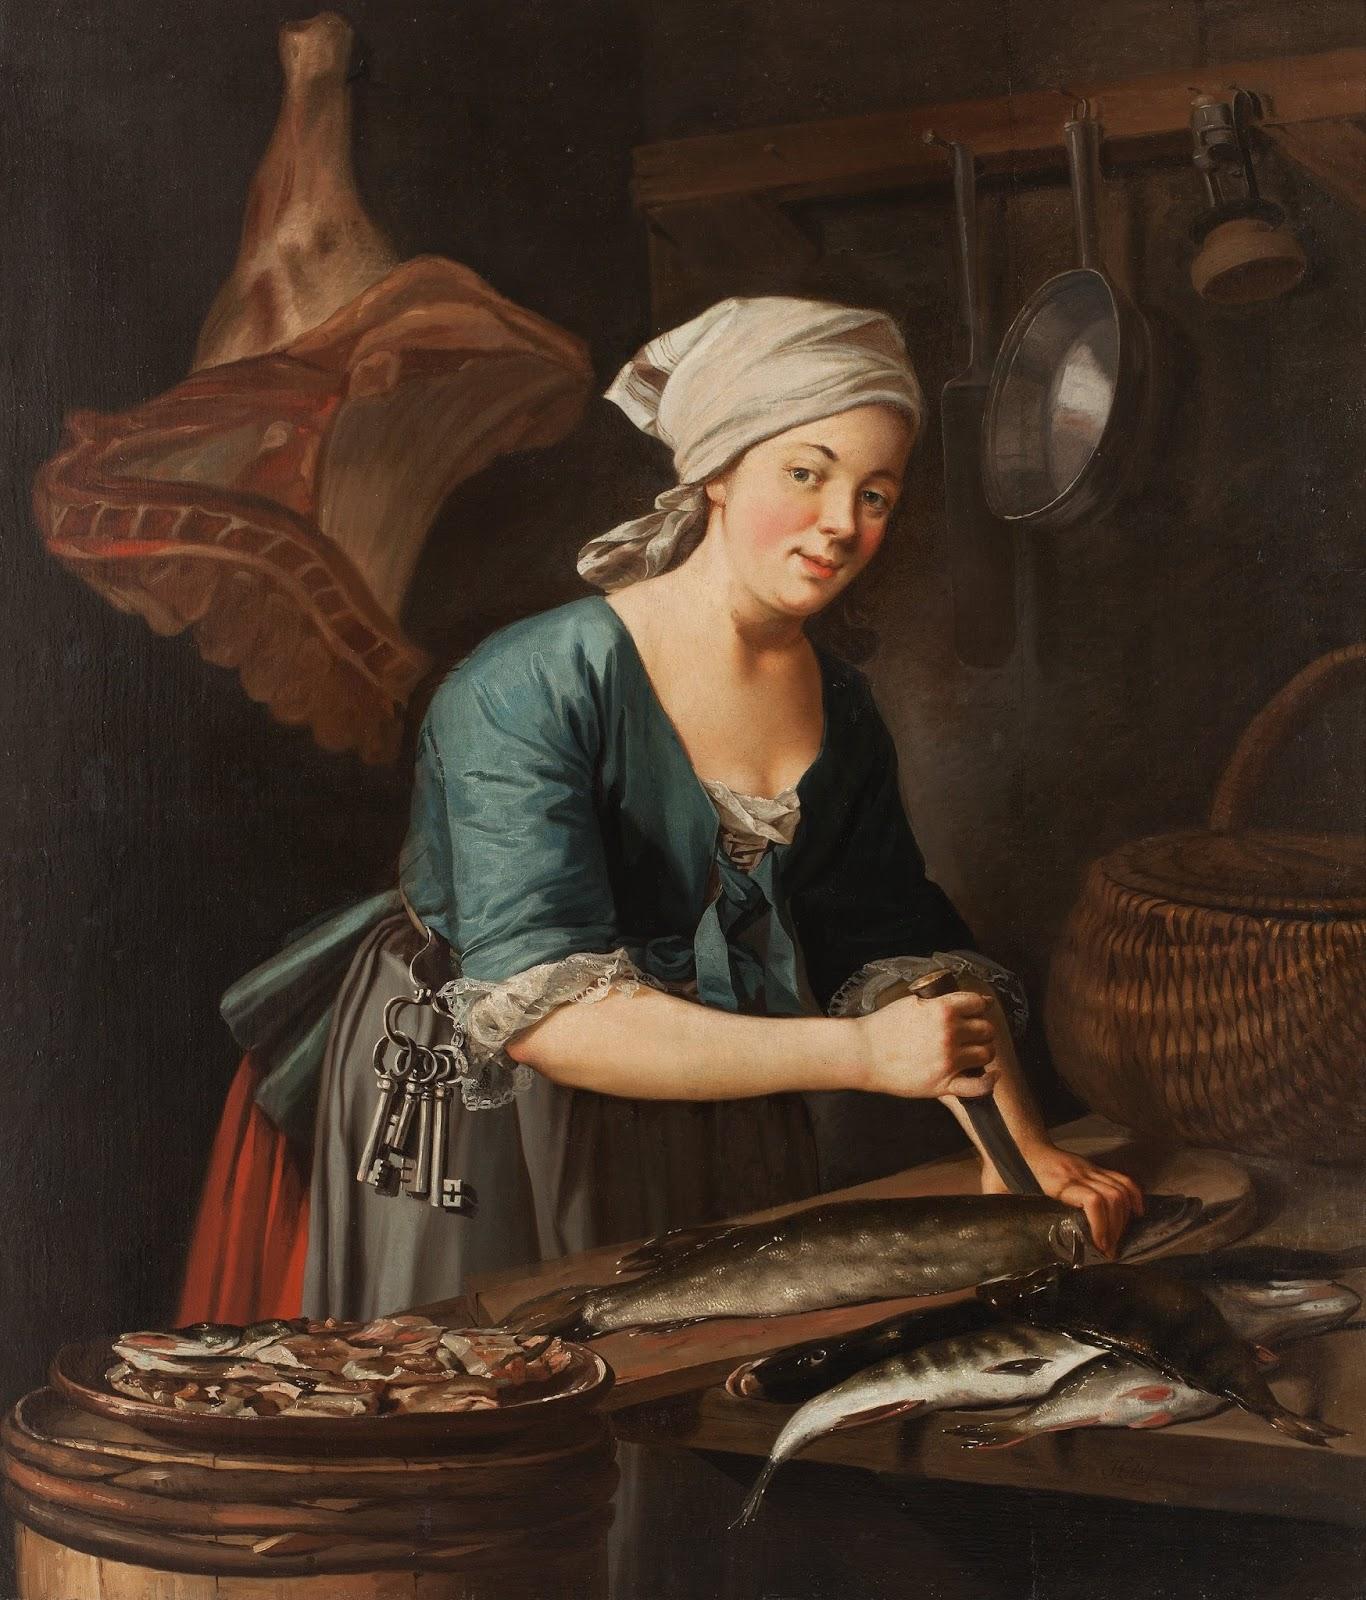 isis wardrobe working women in late 18th century sweden source